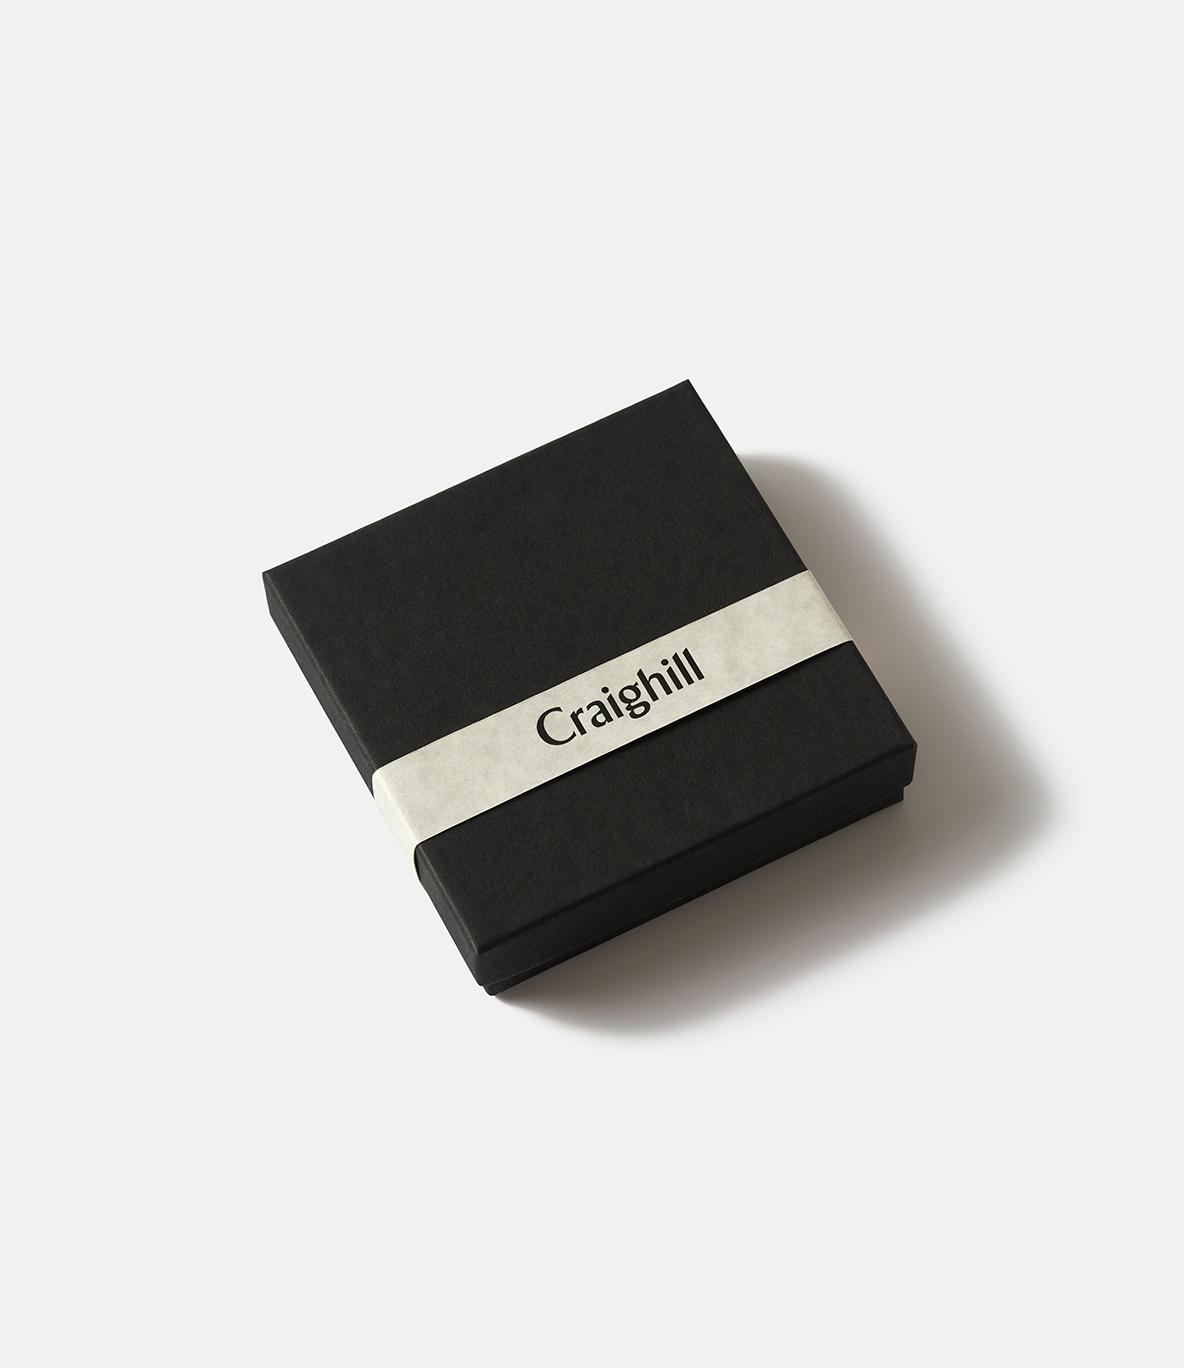 Craighill Radial Cuff Carbon Black — браслет из стали: чёрный карбон